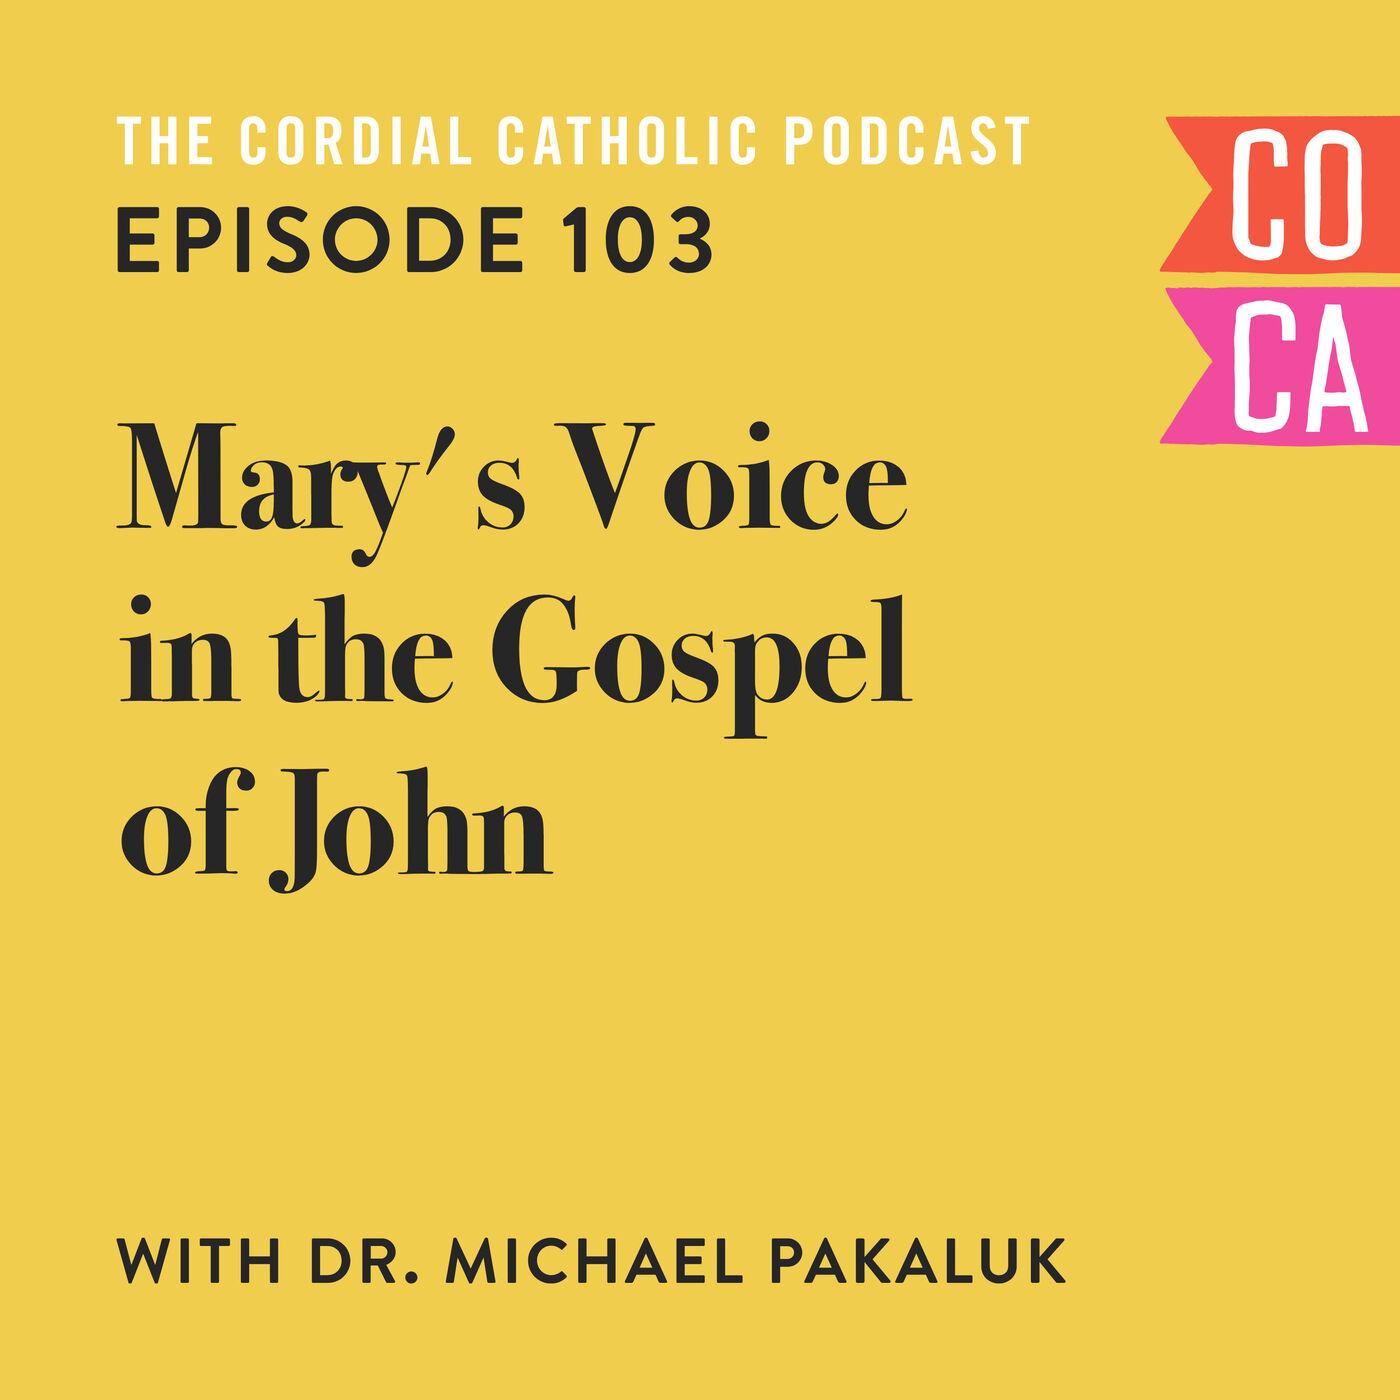 103: Mary's Voice in the Gospel of John (w/ Dr. Michael Pakaluk)